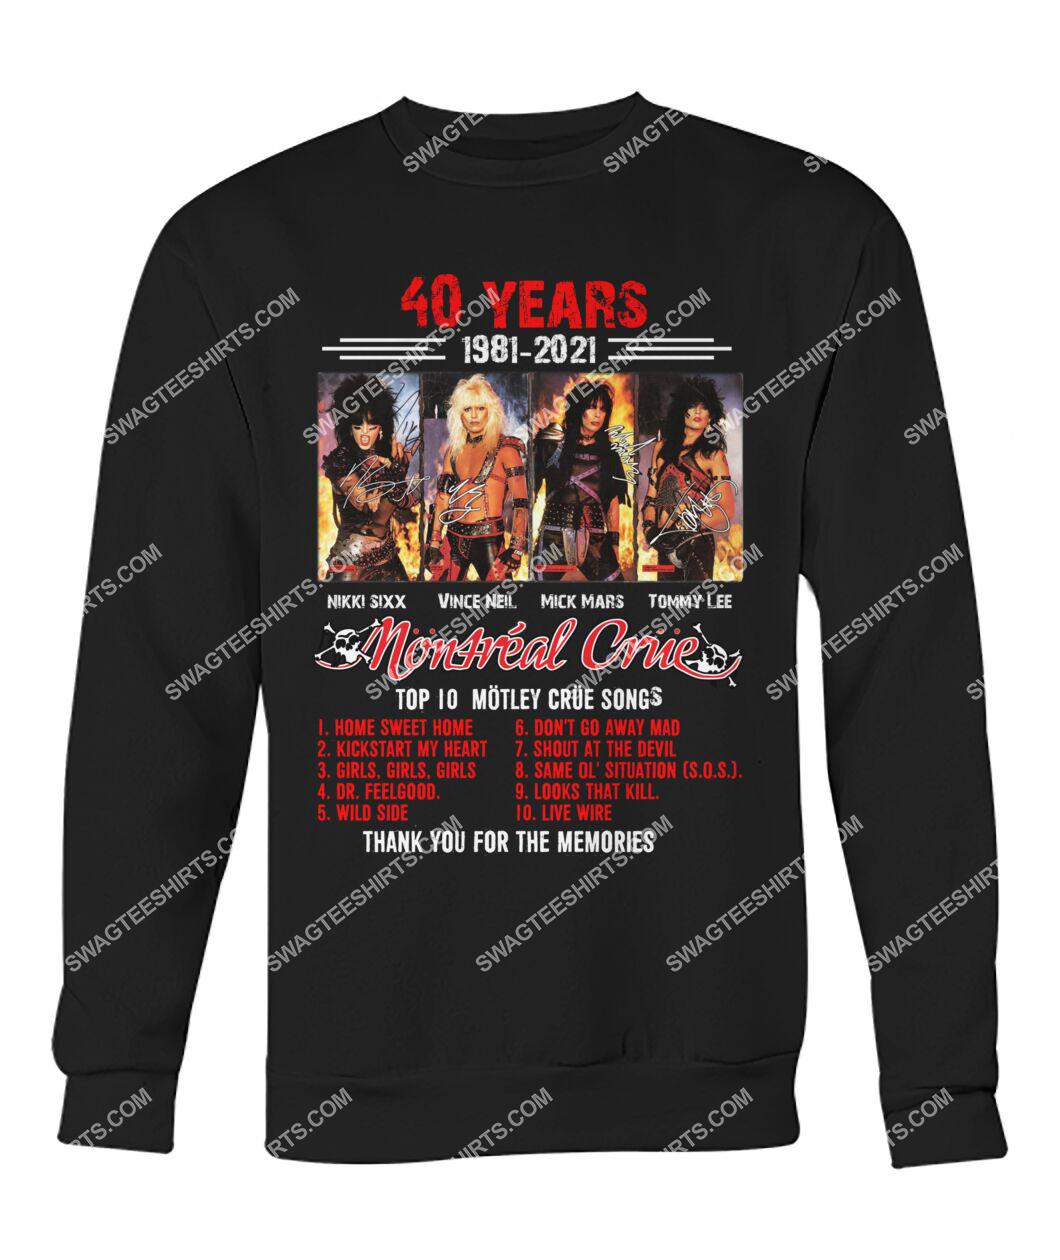 rock band motley crue 40 years thank you for memories signature sweatshirt 1